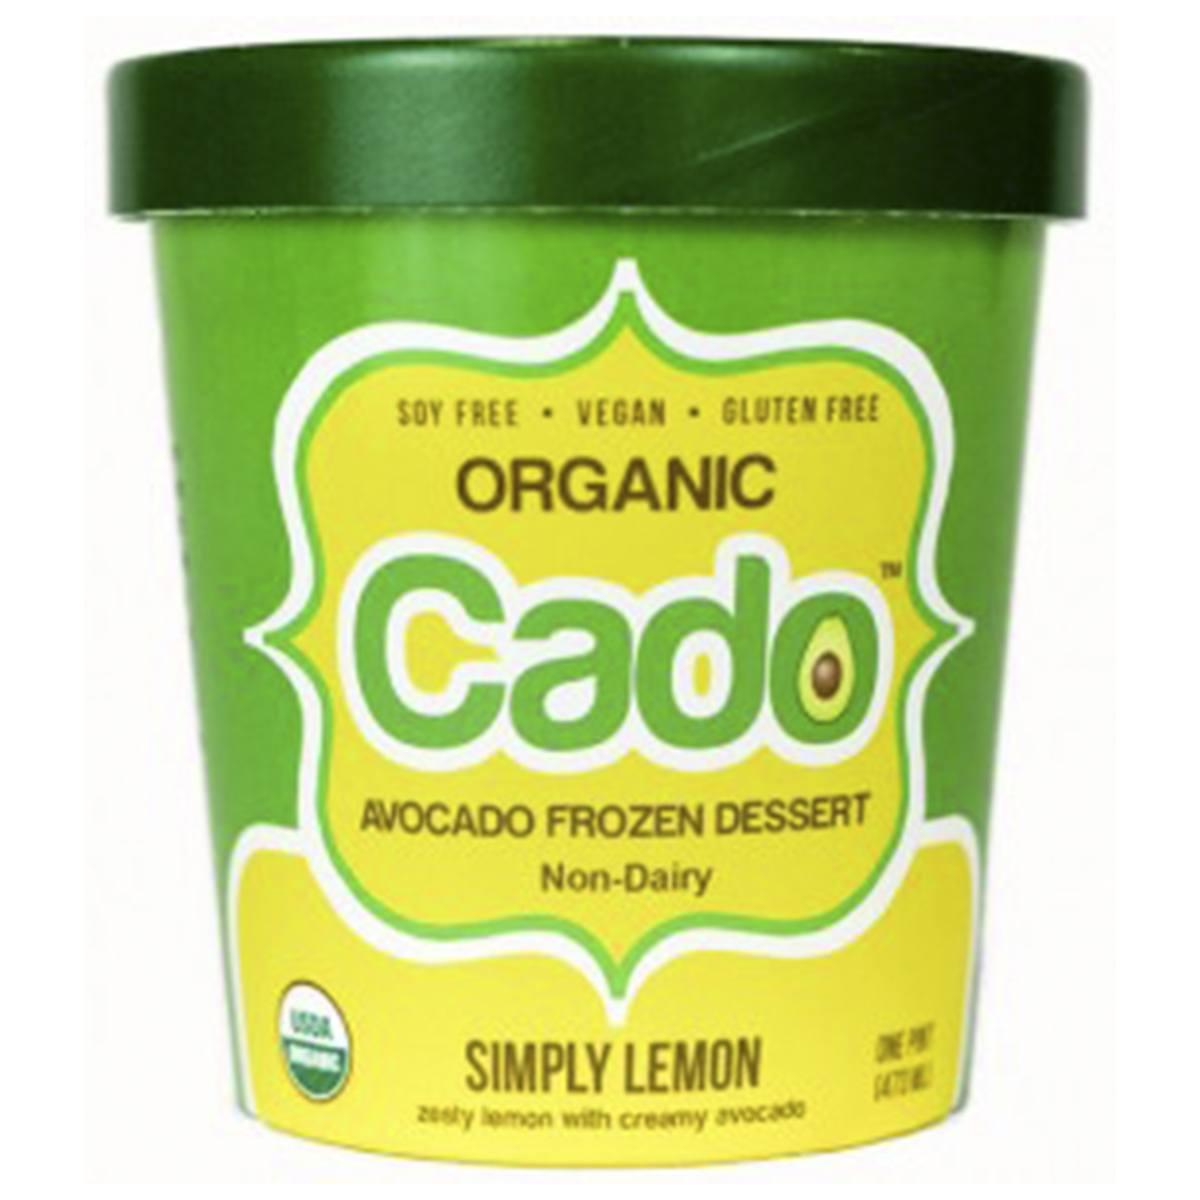 Cado Dairy Free Ice Cream